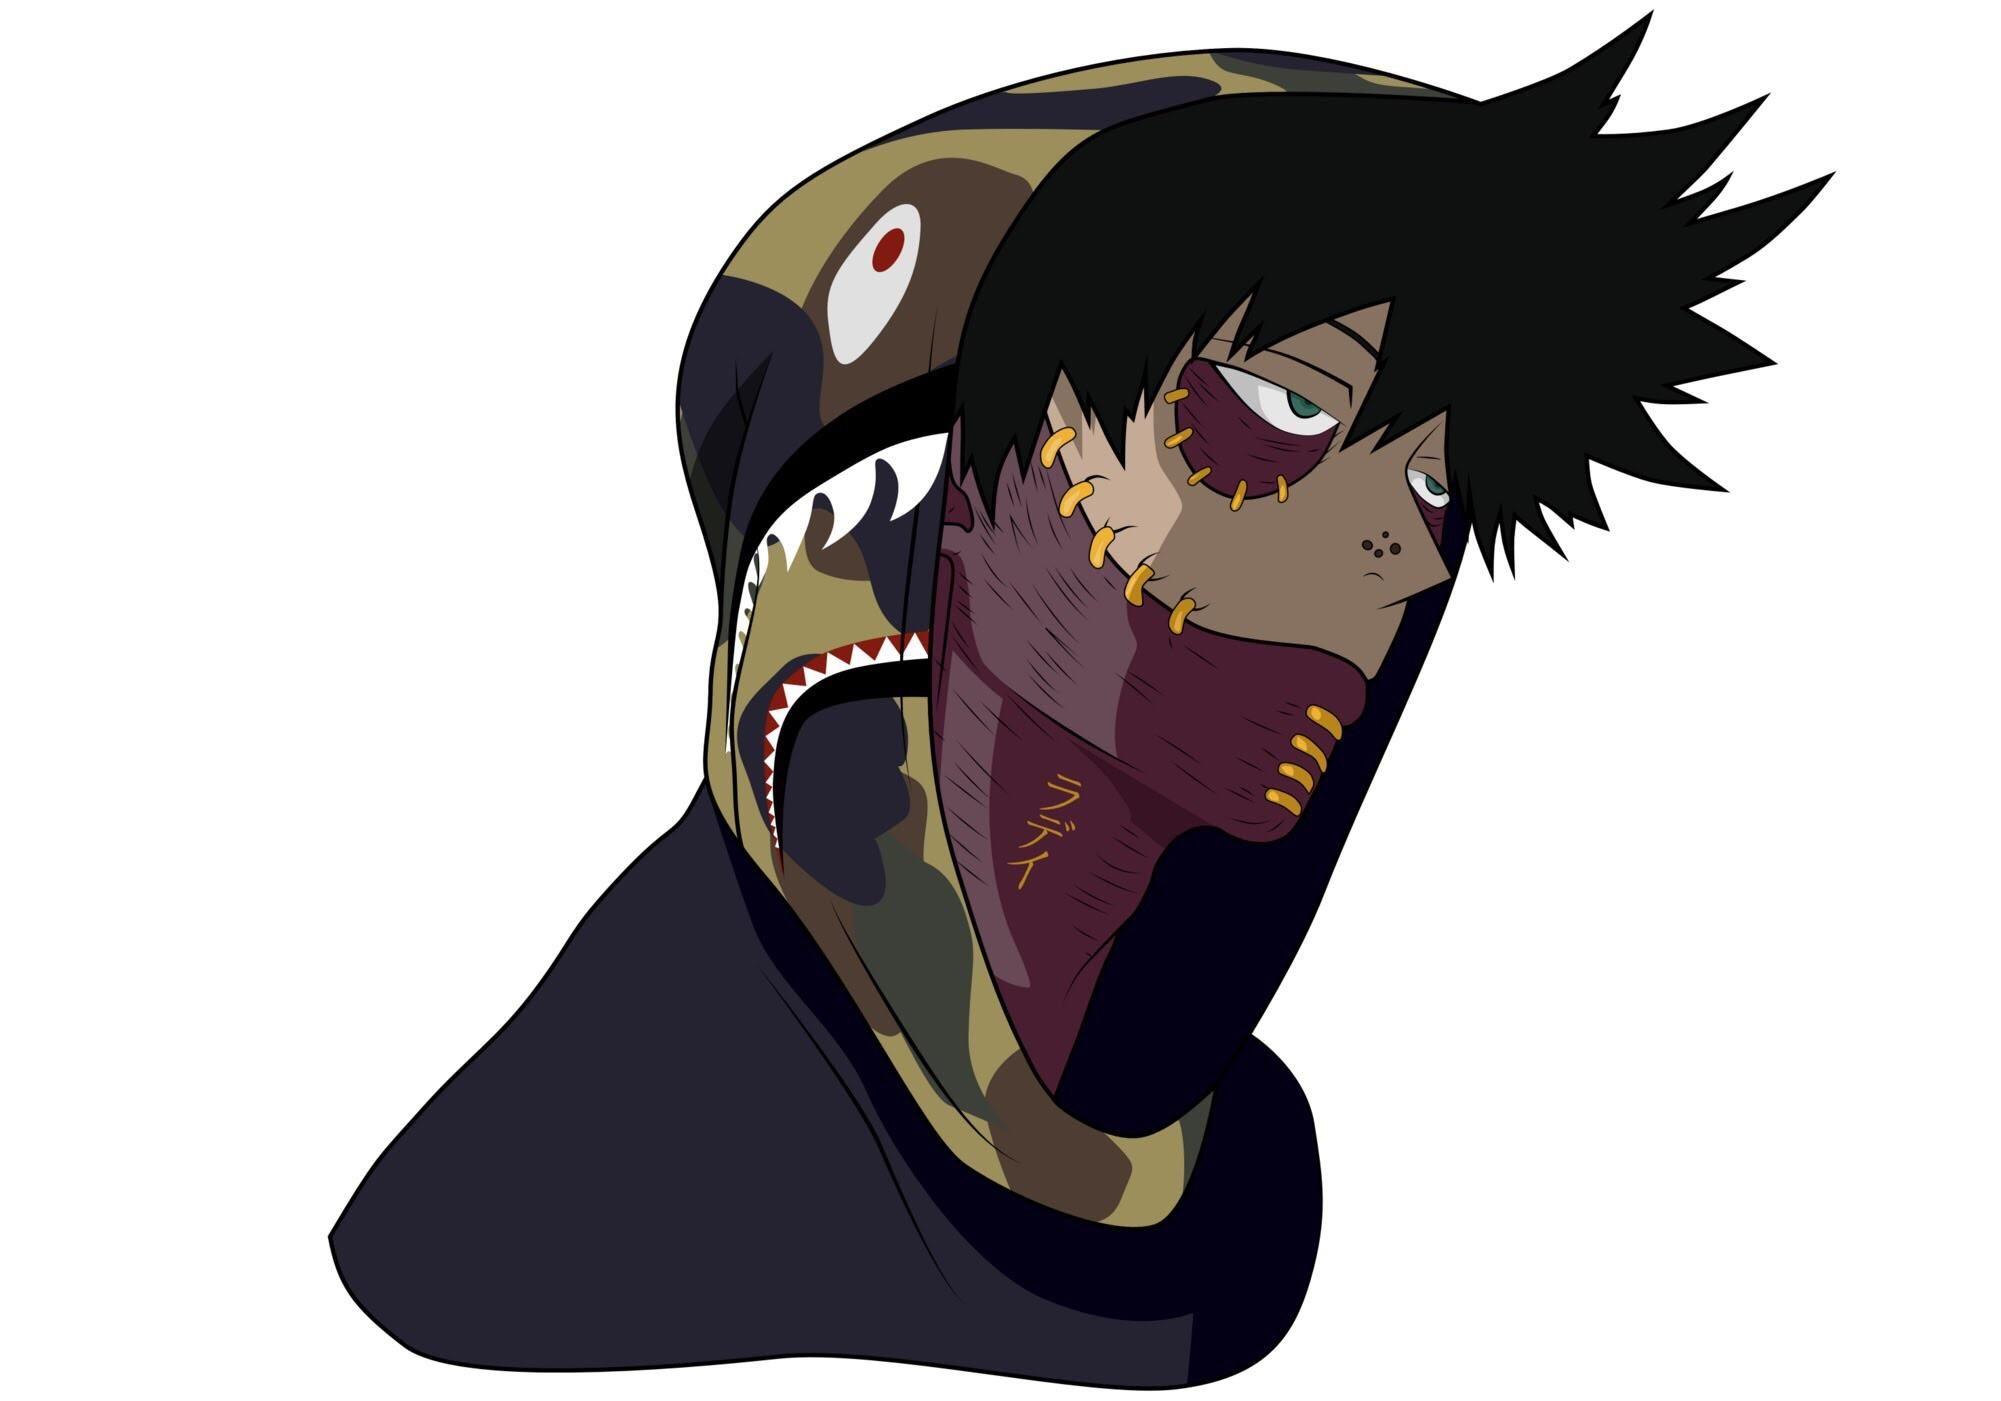 26 Gambar Anime Keren Supreme Gambar Keren Hd Di 2020 Gambar Anime Gambar